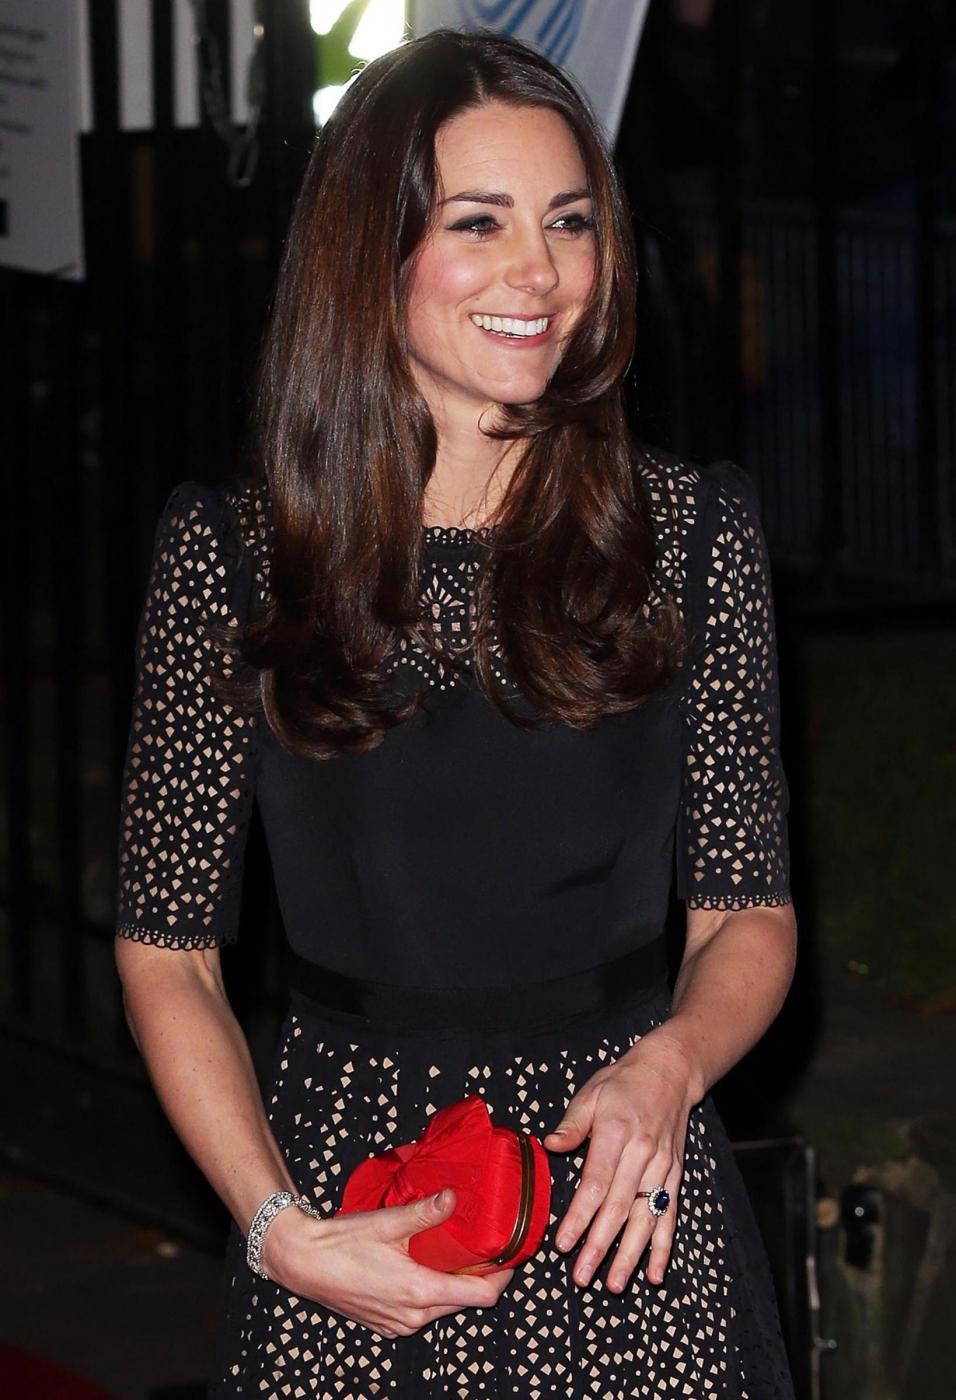 Kate Middleton incontra gli atleti al London SportsBall 04